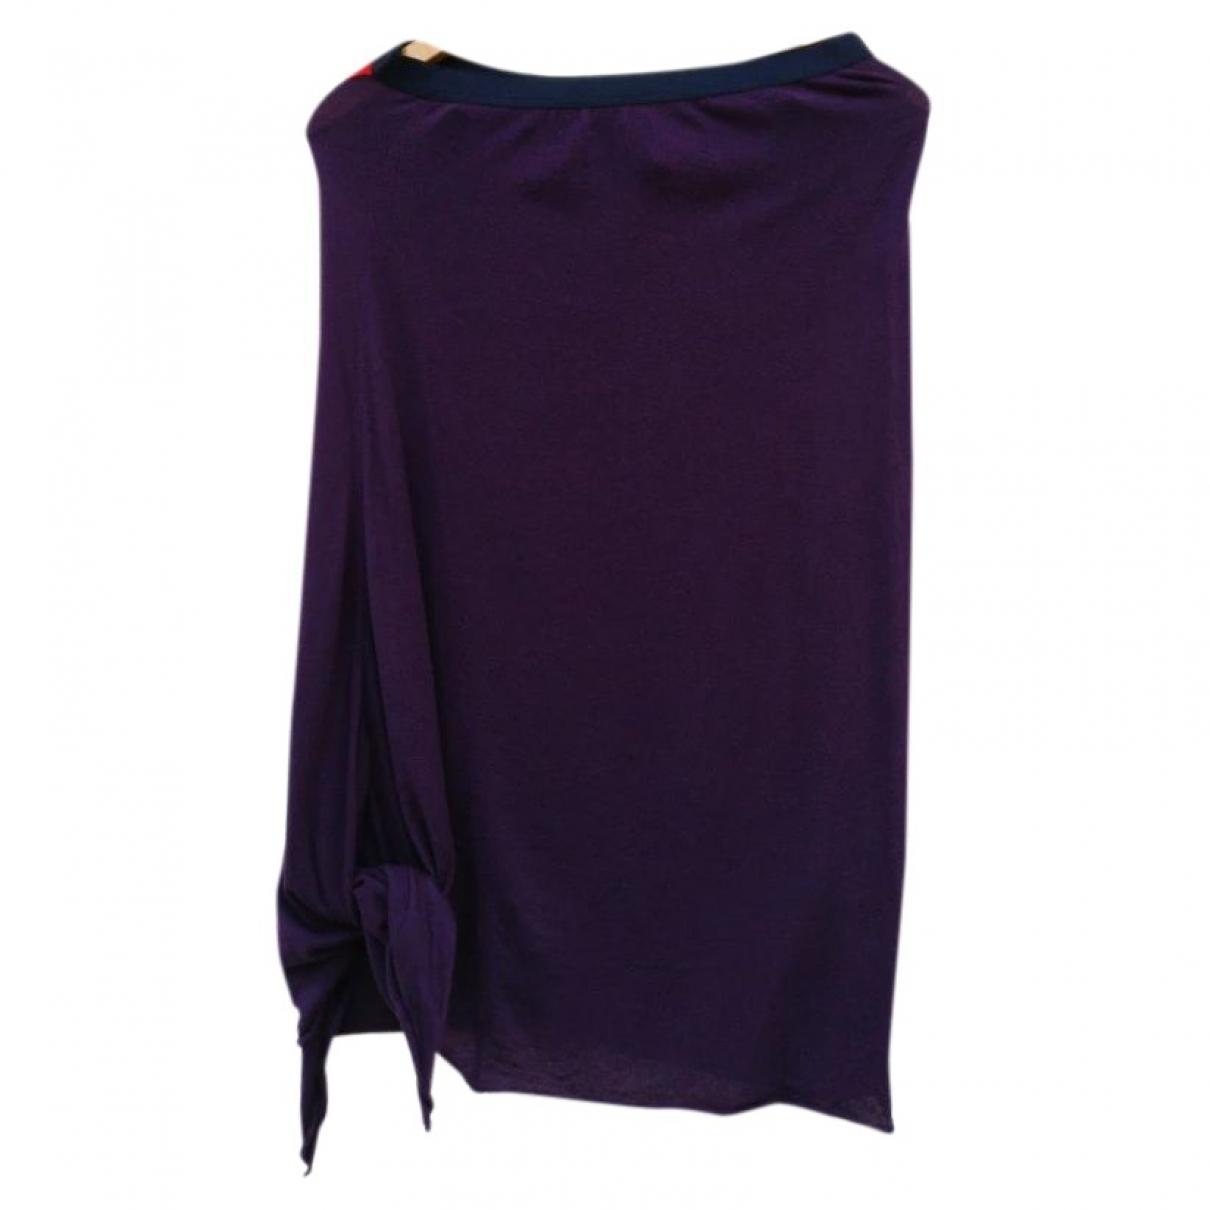 Yohji Yamamoto \N Purple Cotton skirt for Women 2 0-5